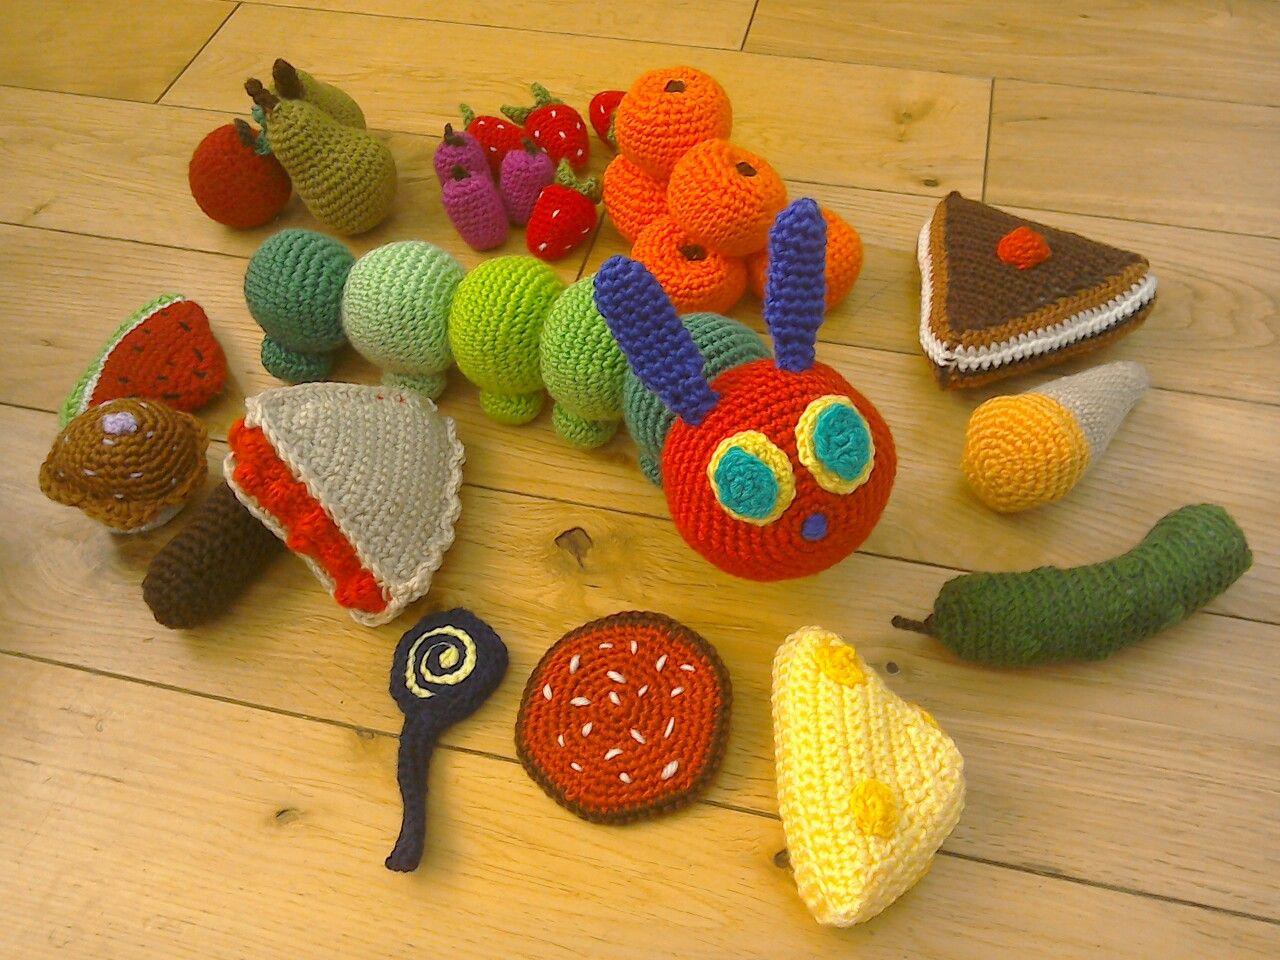 Amigurumi Caterpillar : Crochet the hungry caterpillar hmmm can i crochet that